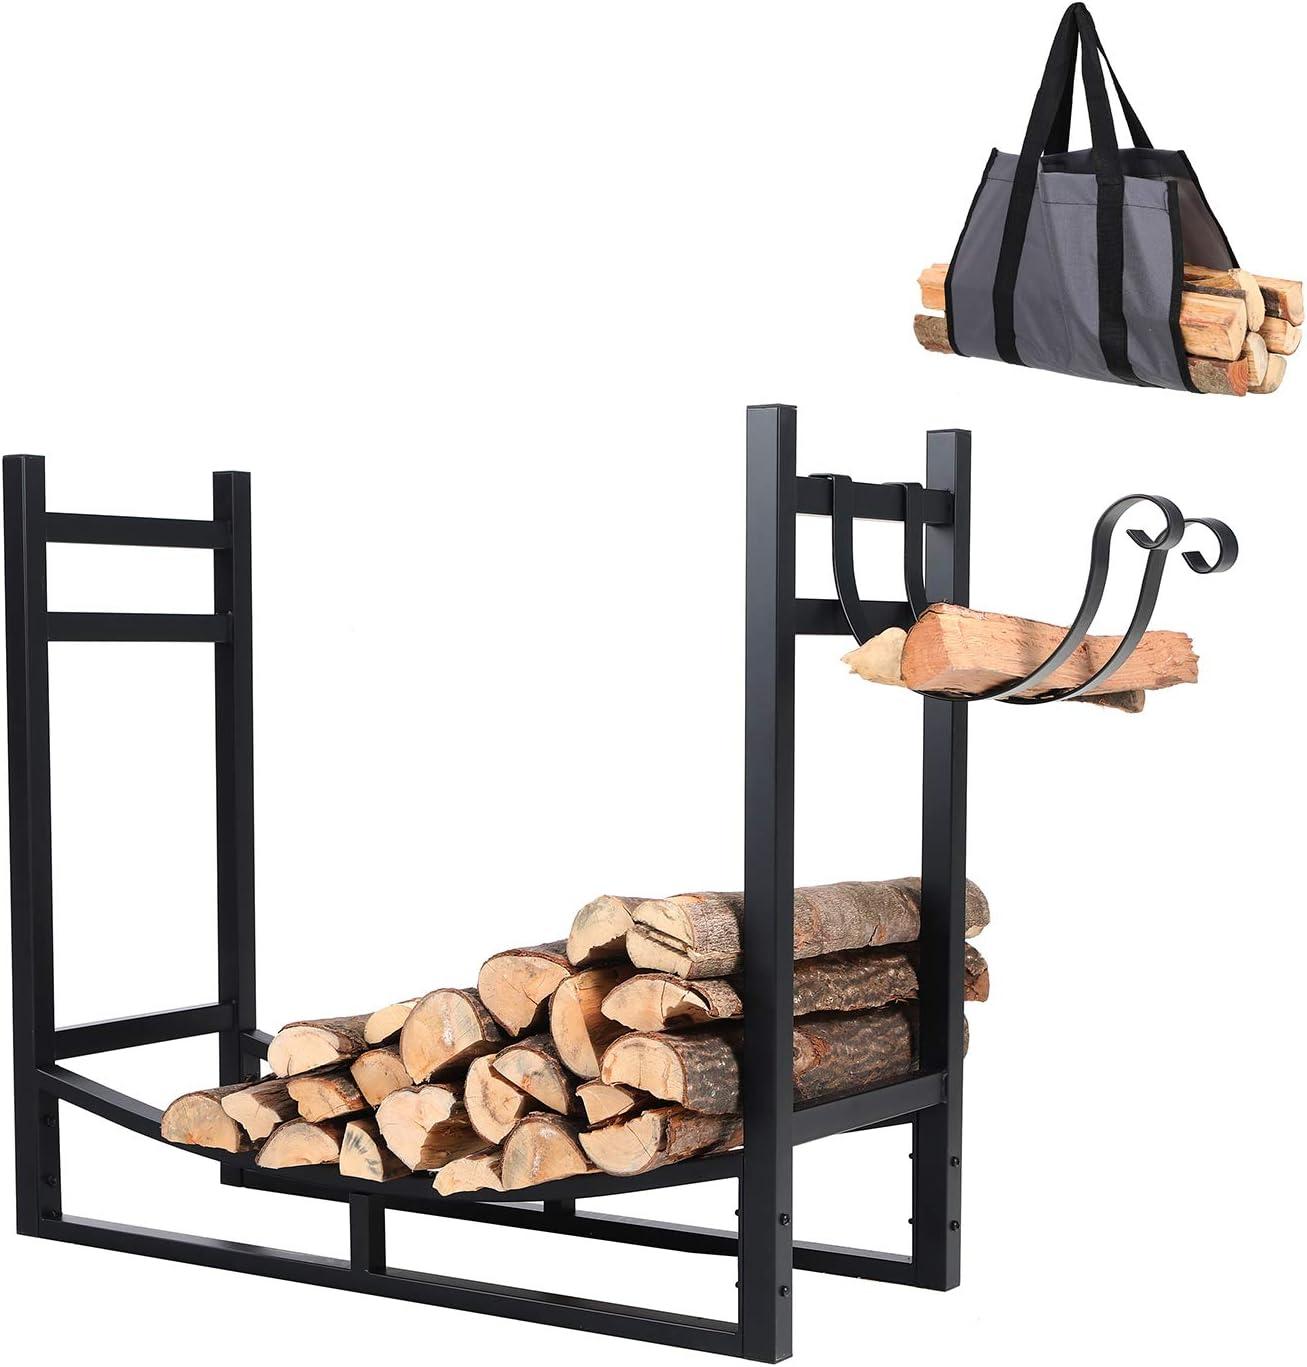 PHI VILLA Heavy Duty Firewood Racks Indoor Outdoor Log Rack with Kindling Holder, 30 Inches Tall, Black